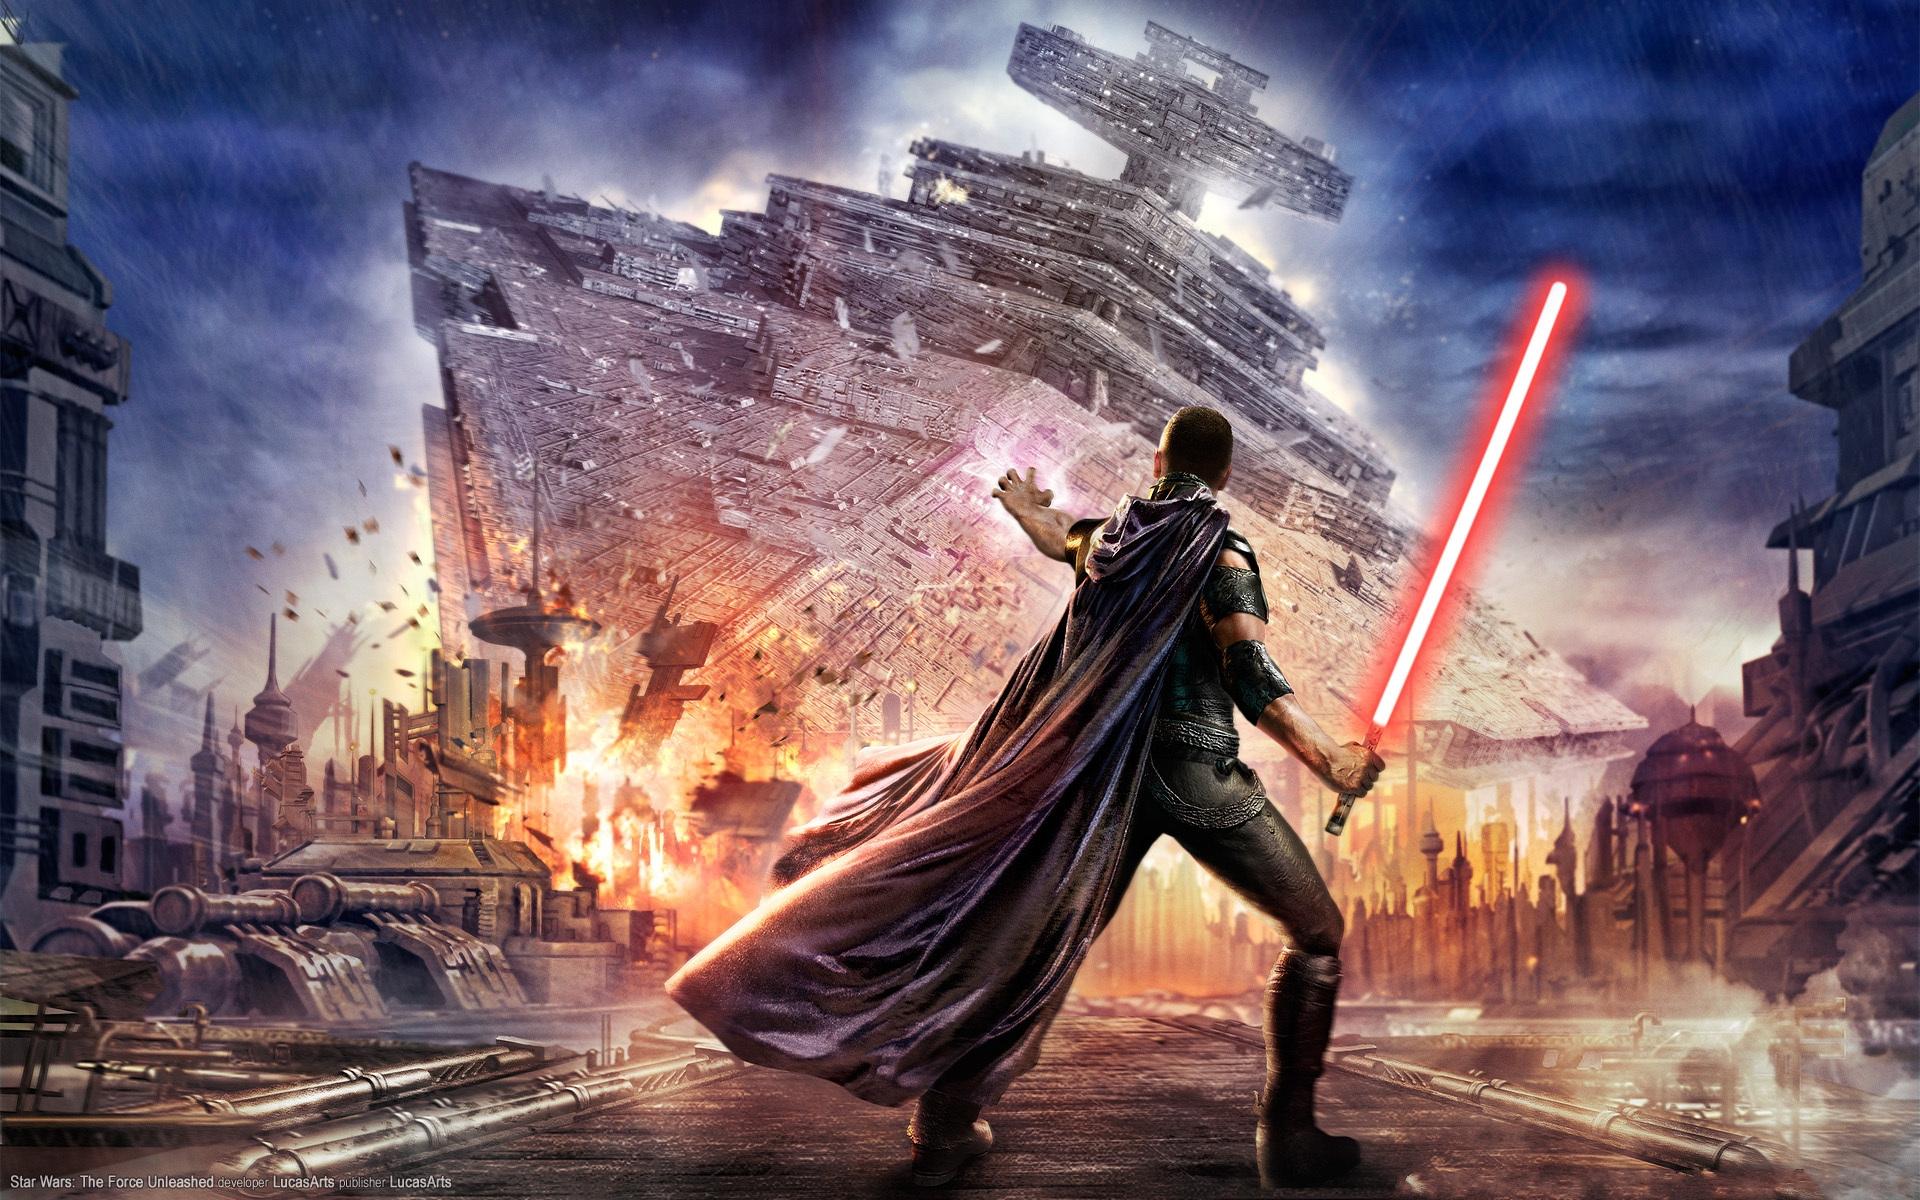 Star Wars Desktop Wallpapers FREE on Latoro.com